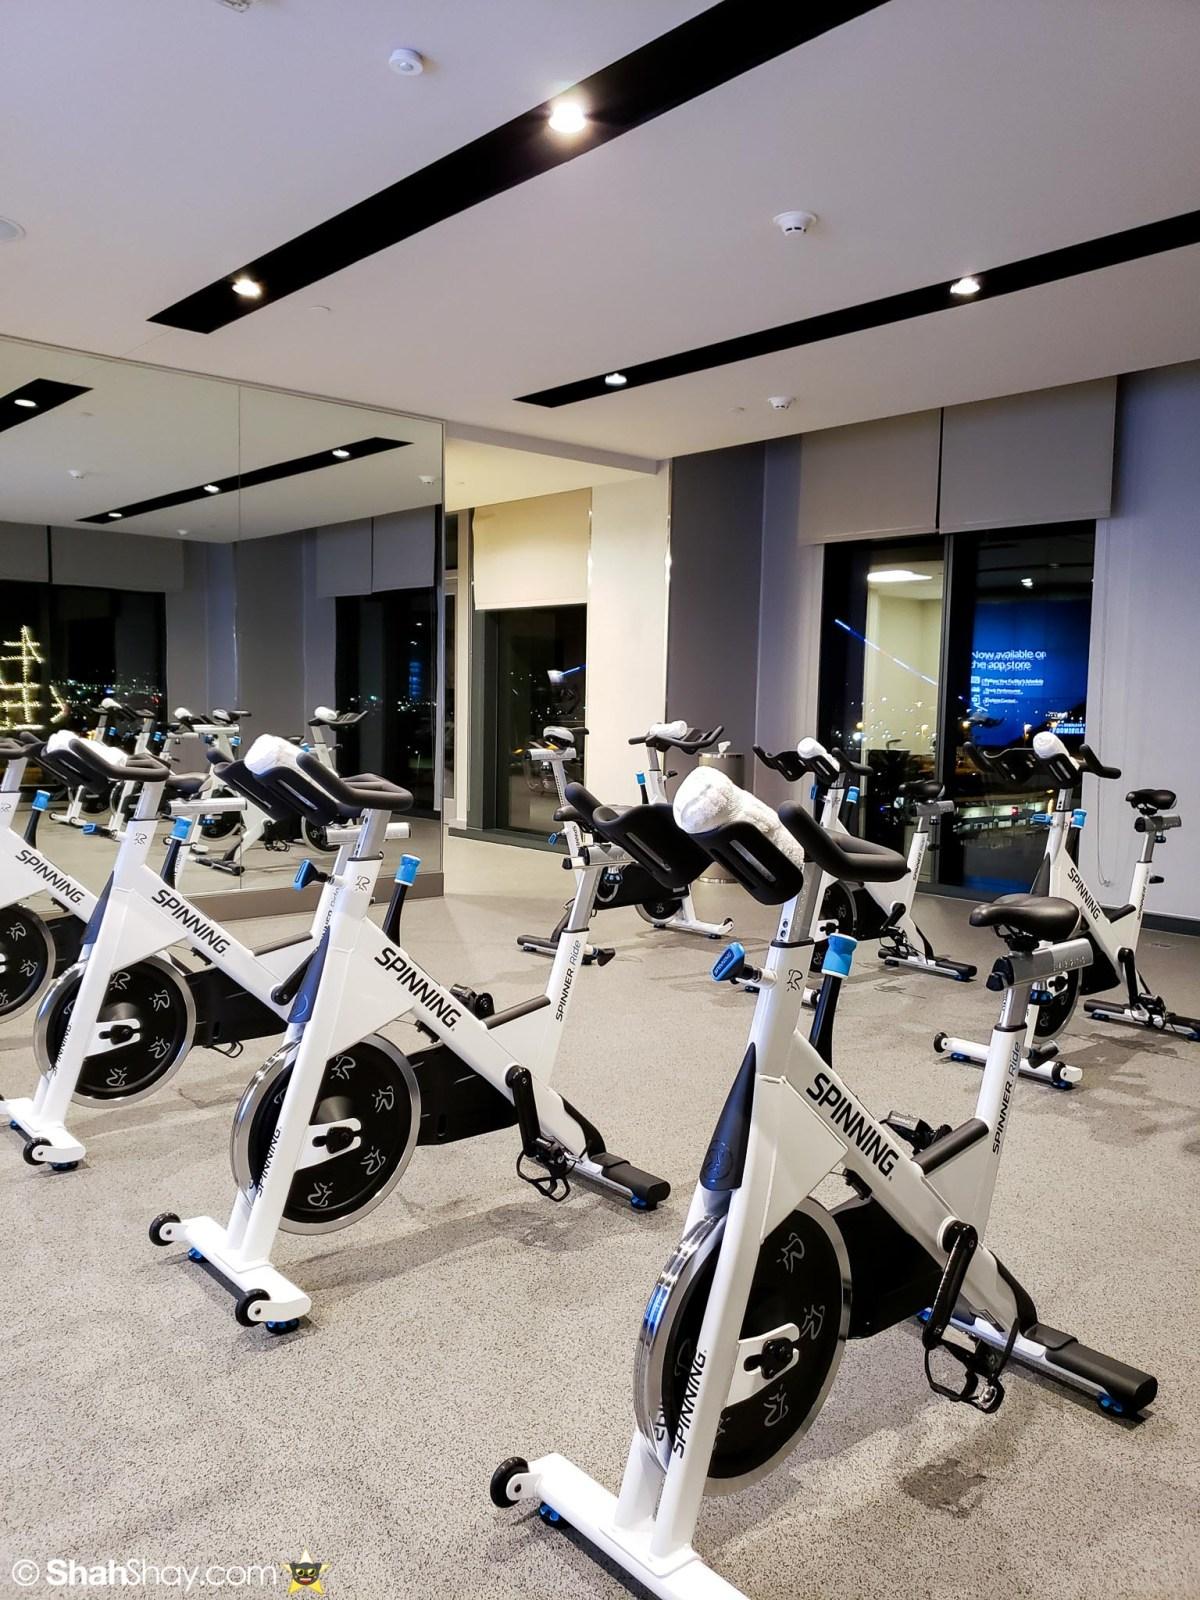 InterContinental San Diego Fitness Center - Spin Bikes